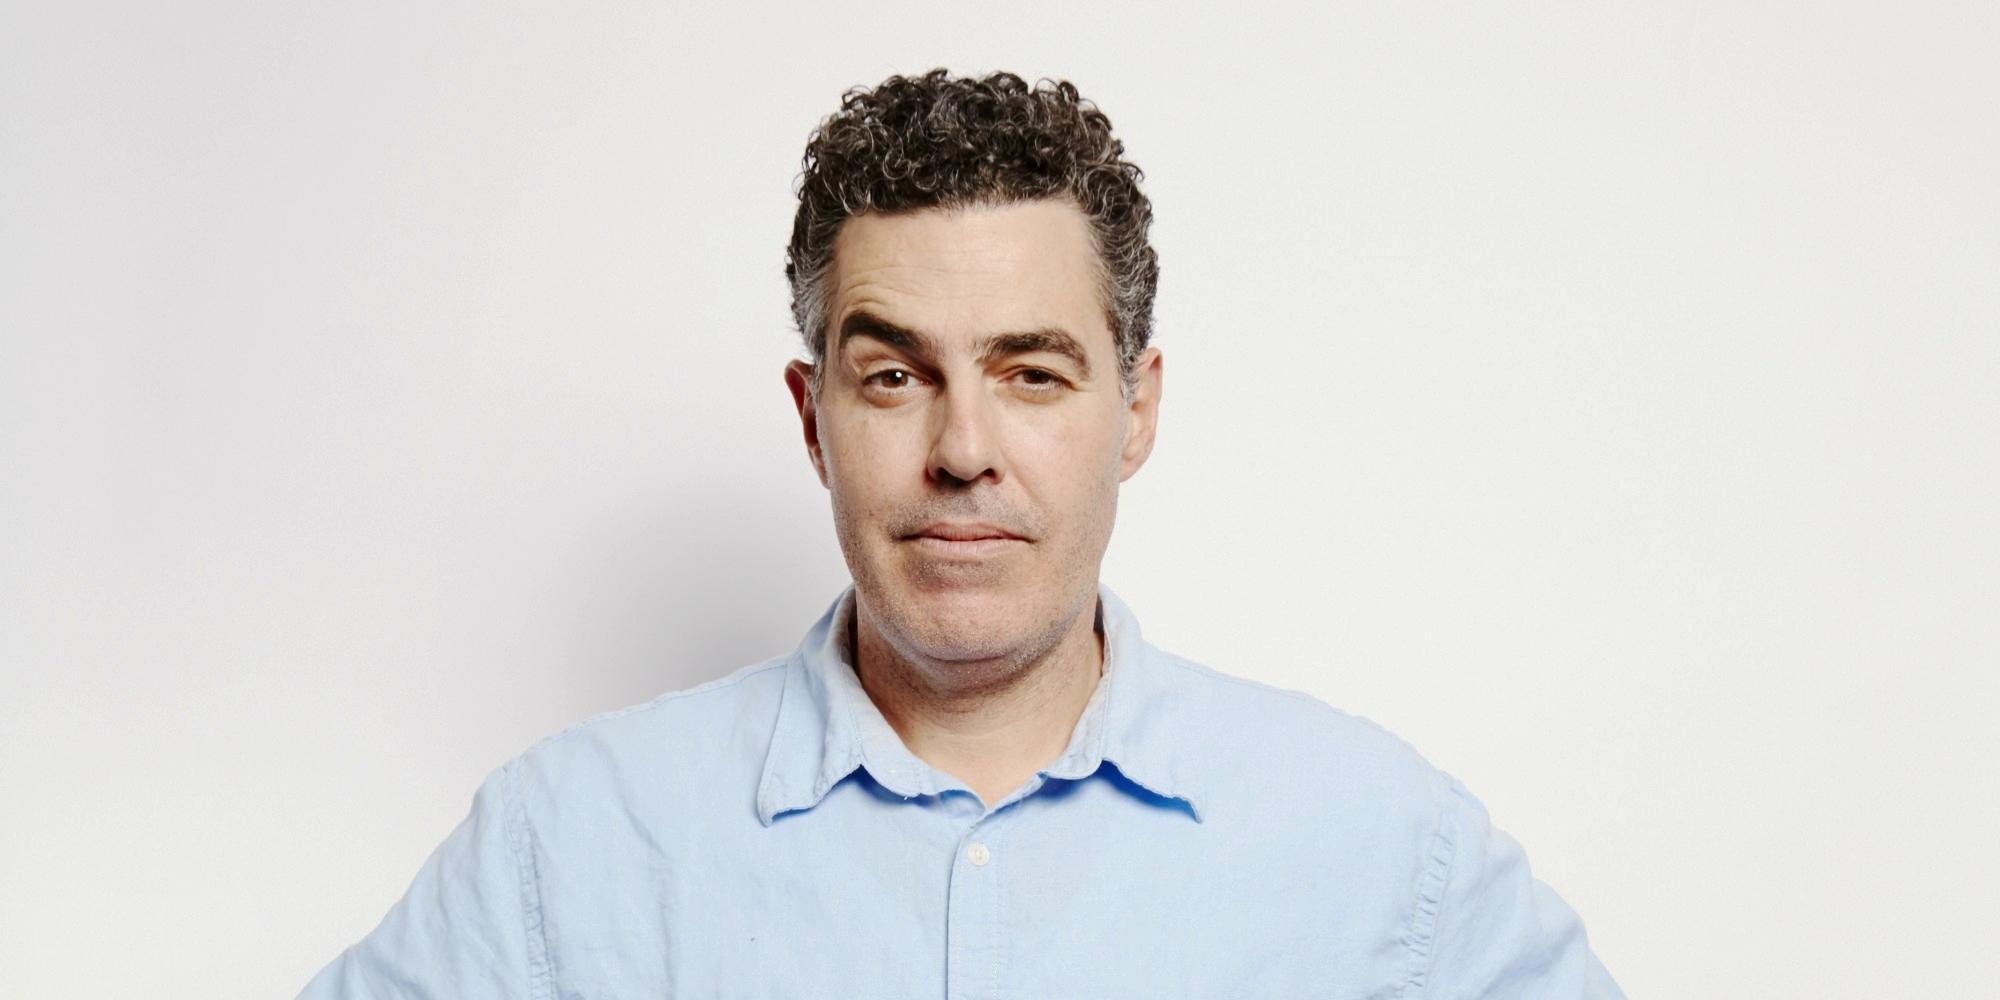 Adam Carolla - Comedian, TV Host